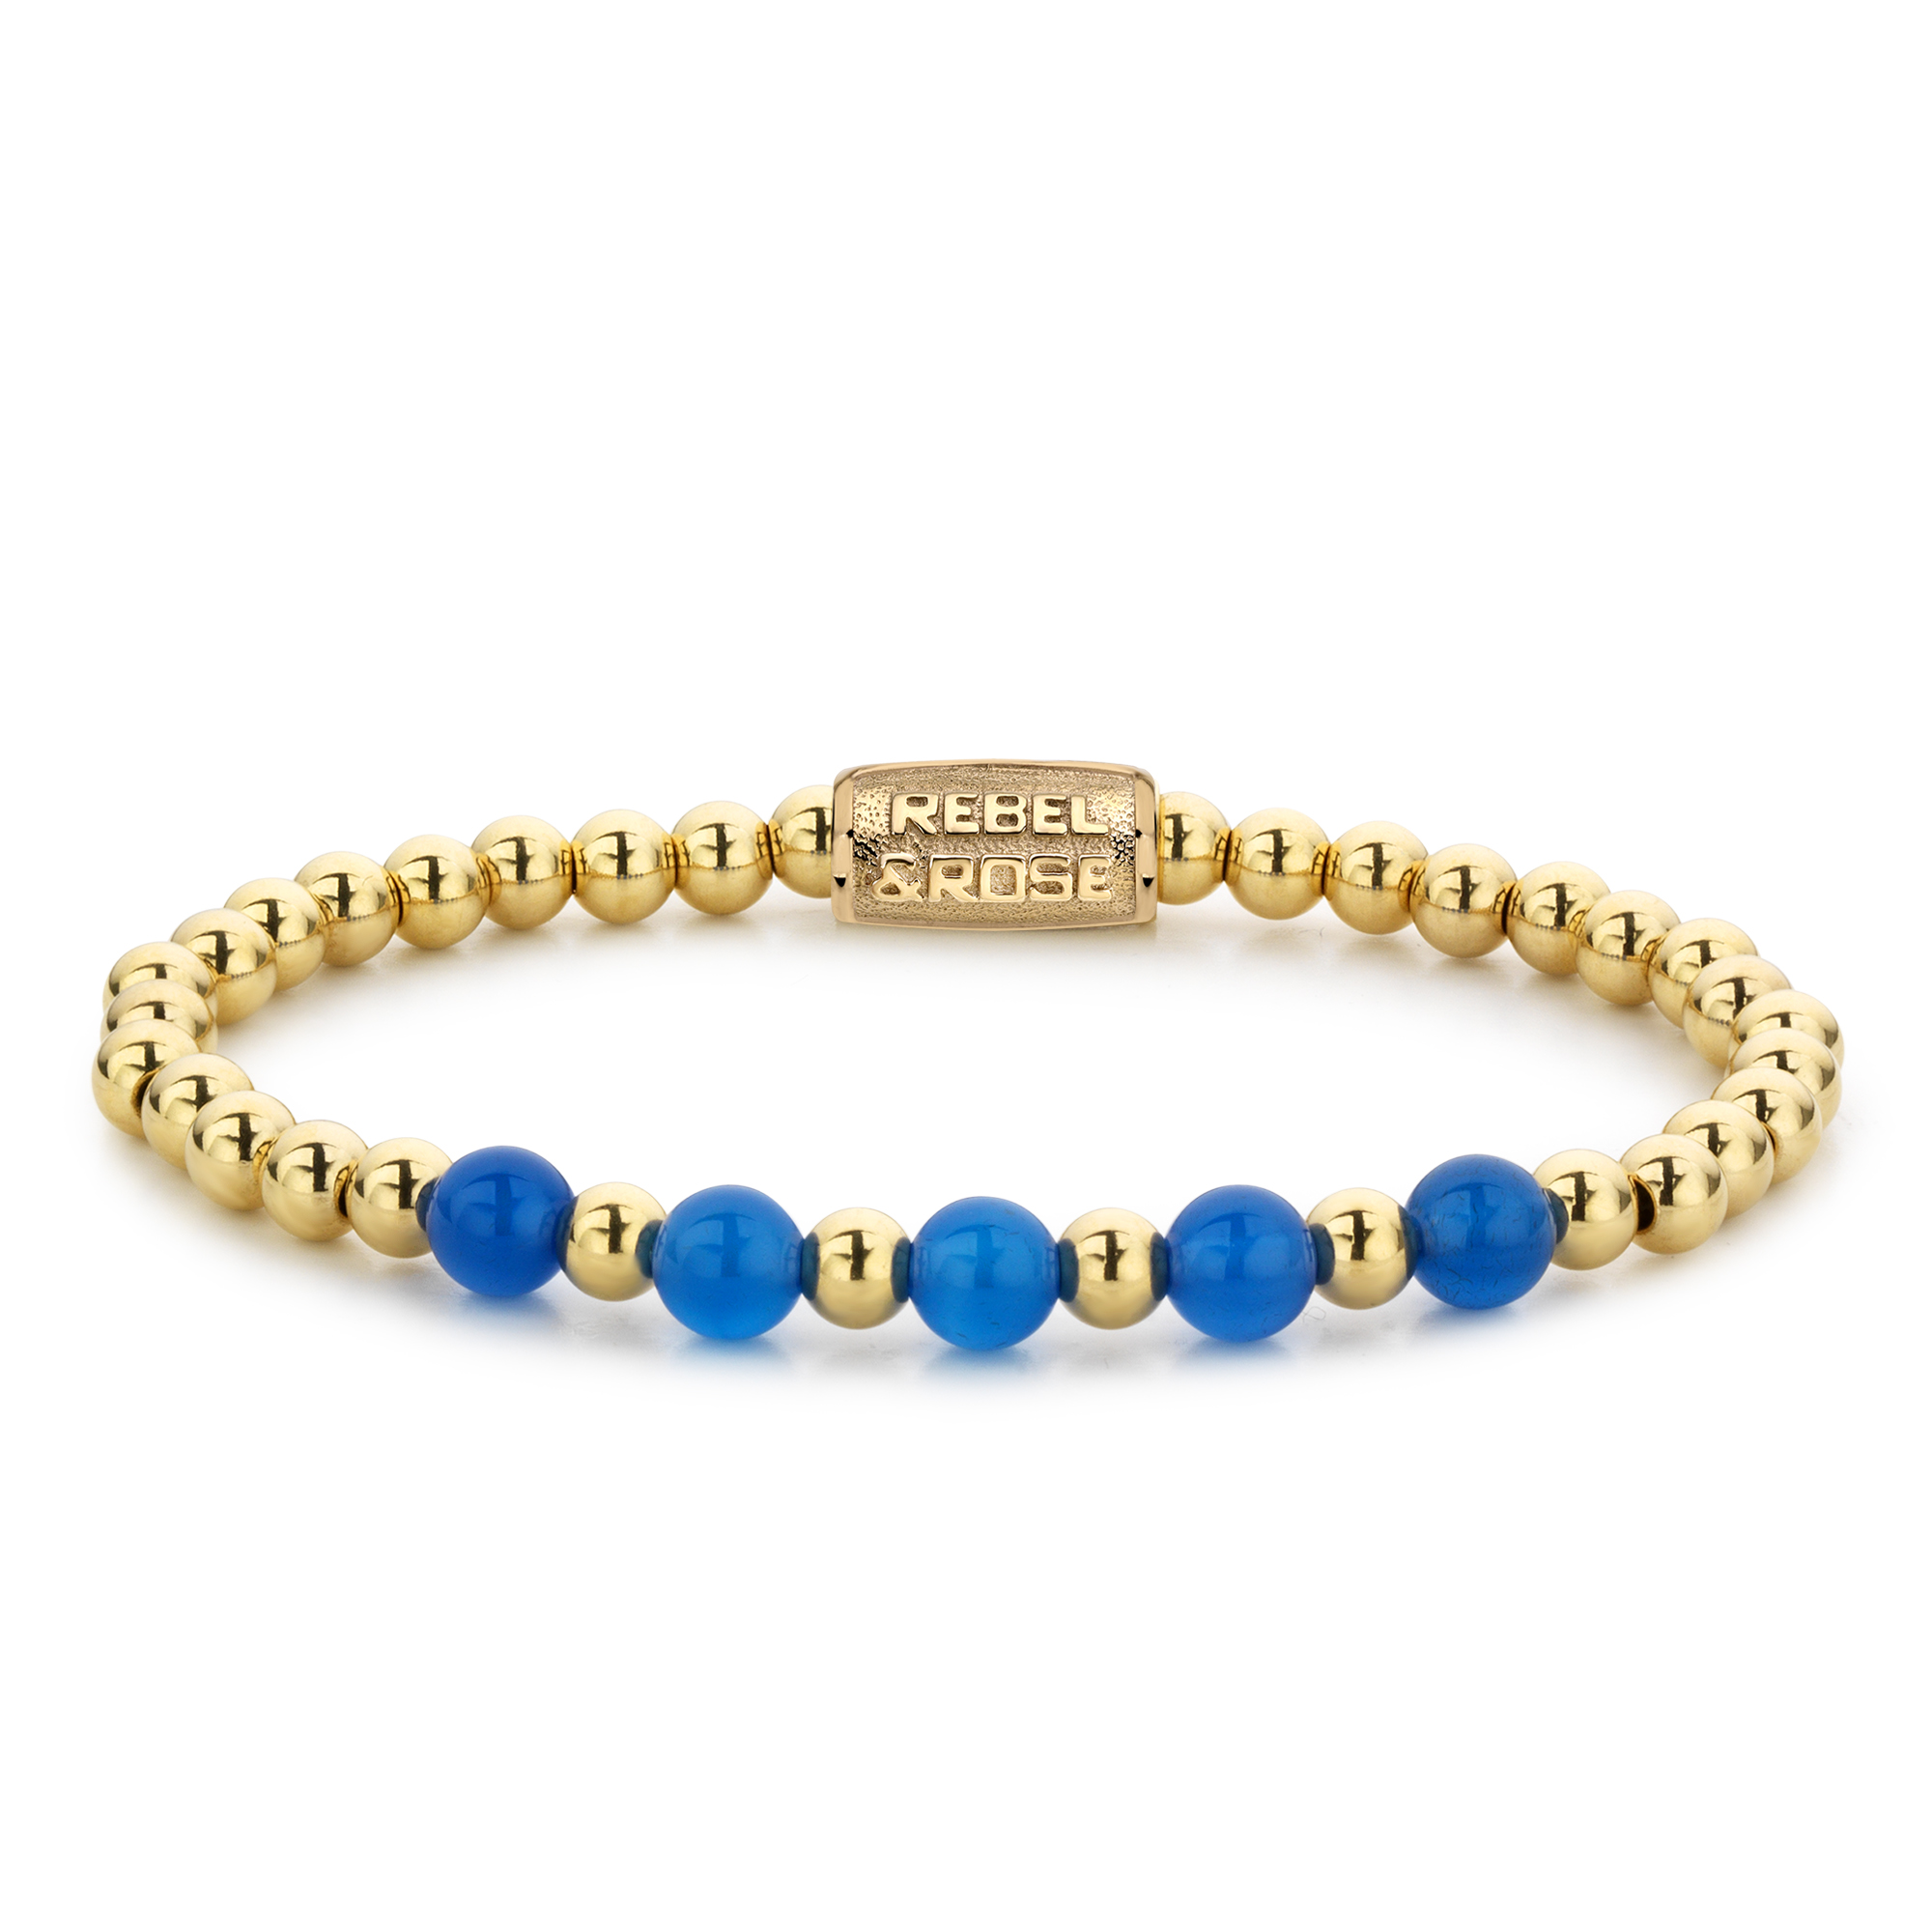 Rebel and Rose RR 60066 G Rekarmband Beads Yellow Gold meets Brightening Blue goudkleurig blauw 6 mm XS 15 cm